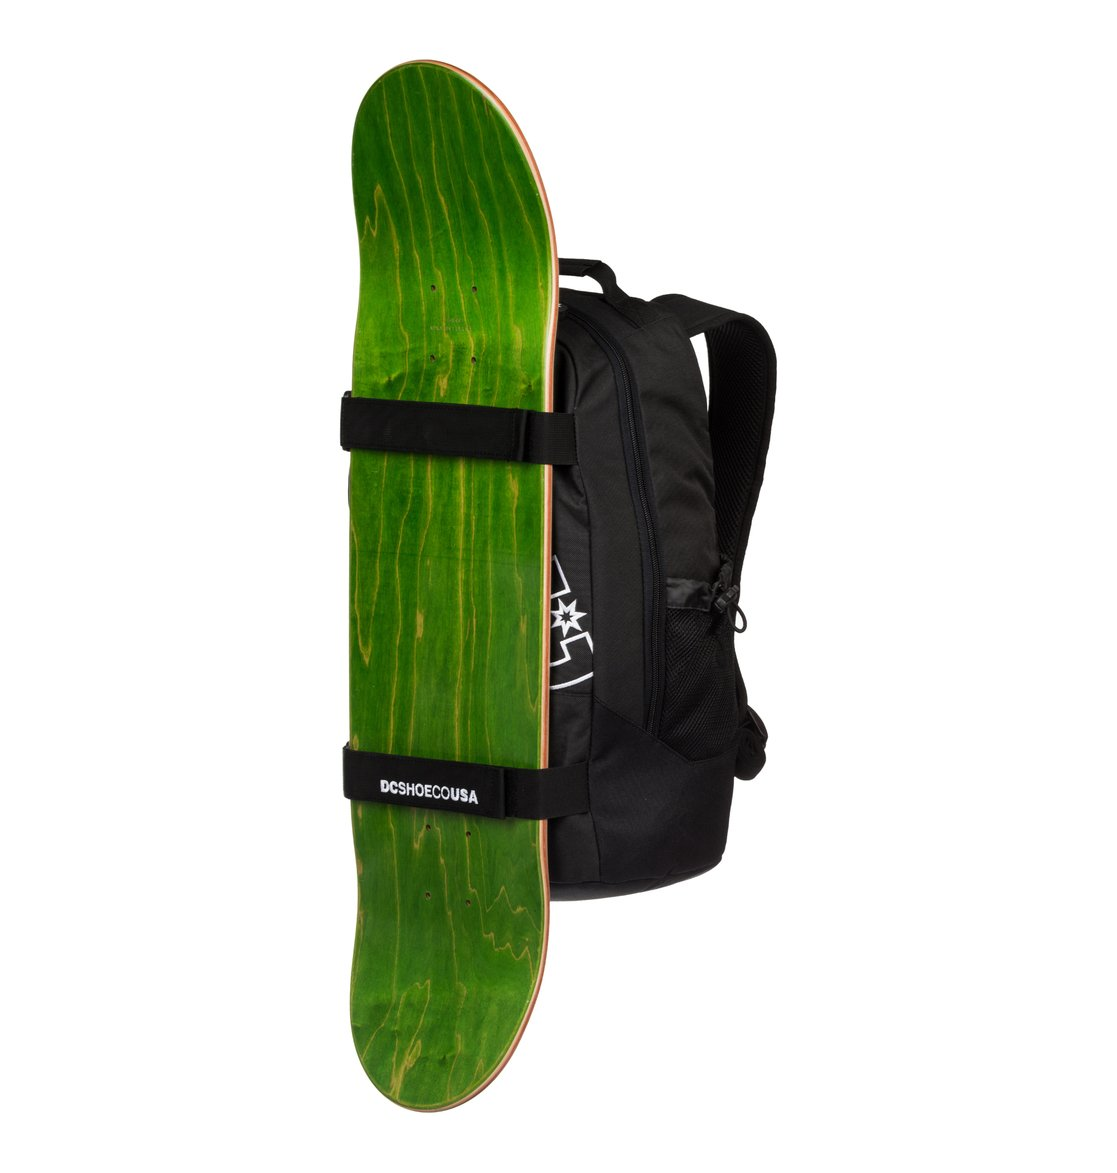 7f5c3a1144cf7 4 Grind - Skate Backpack EDYBP03030 DC Shoes